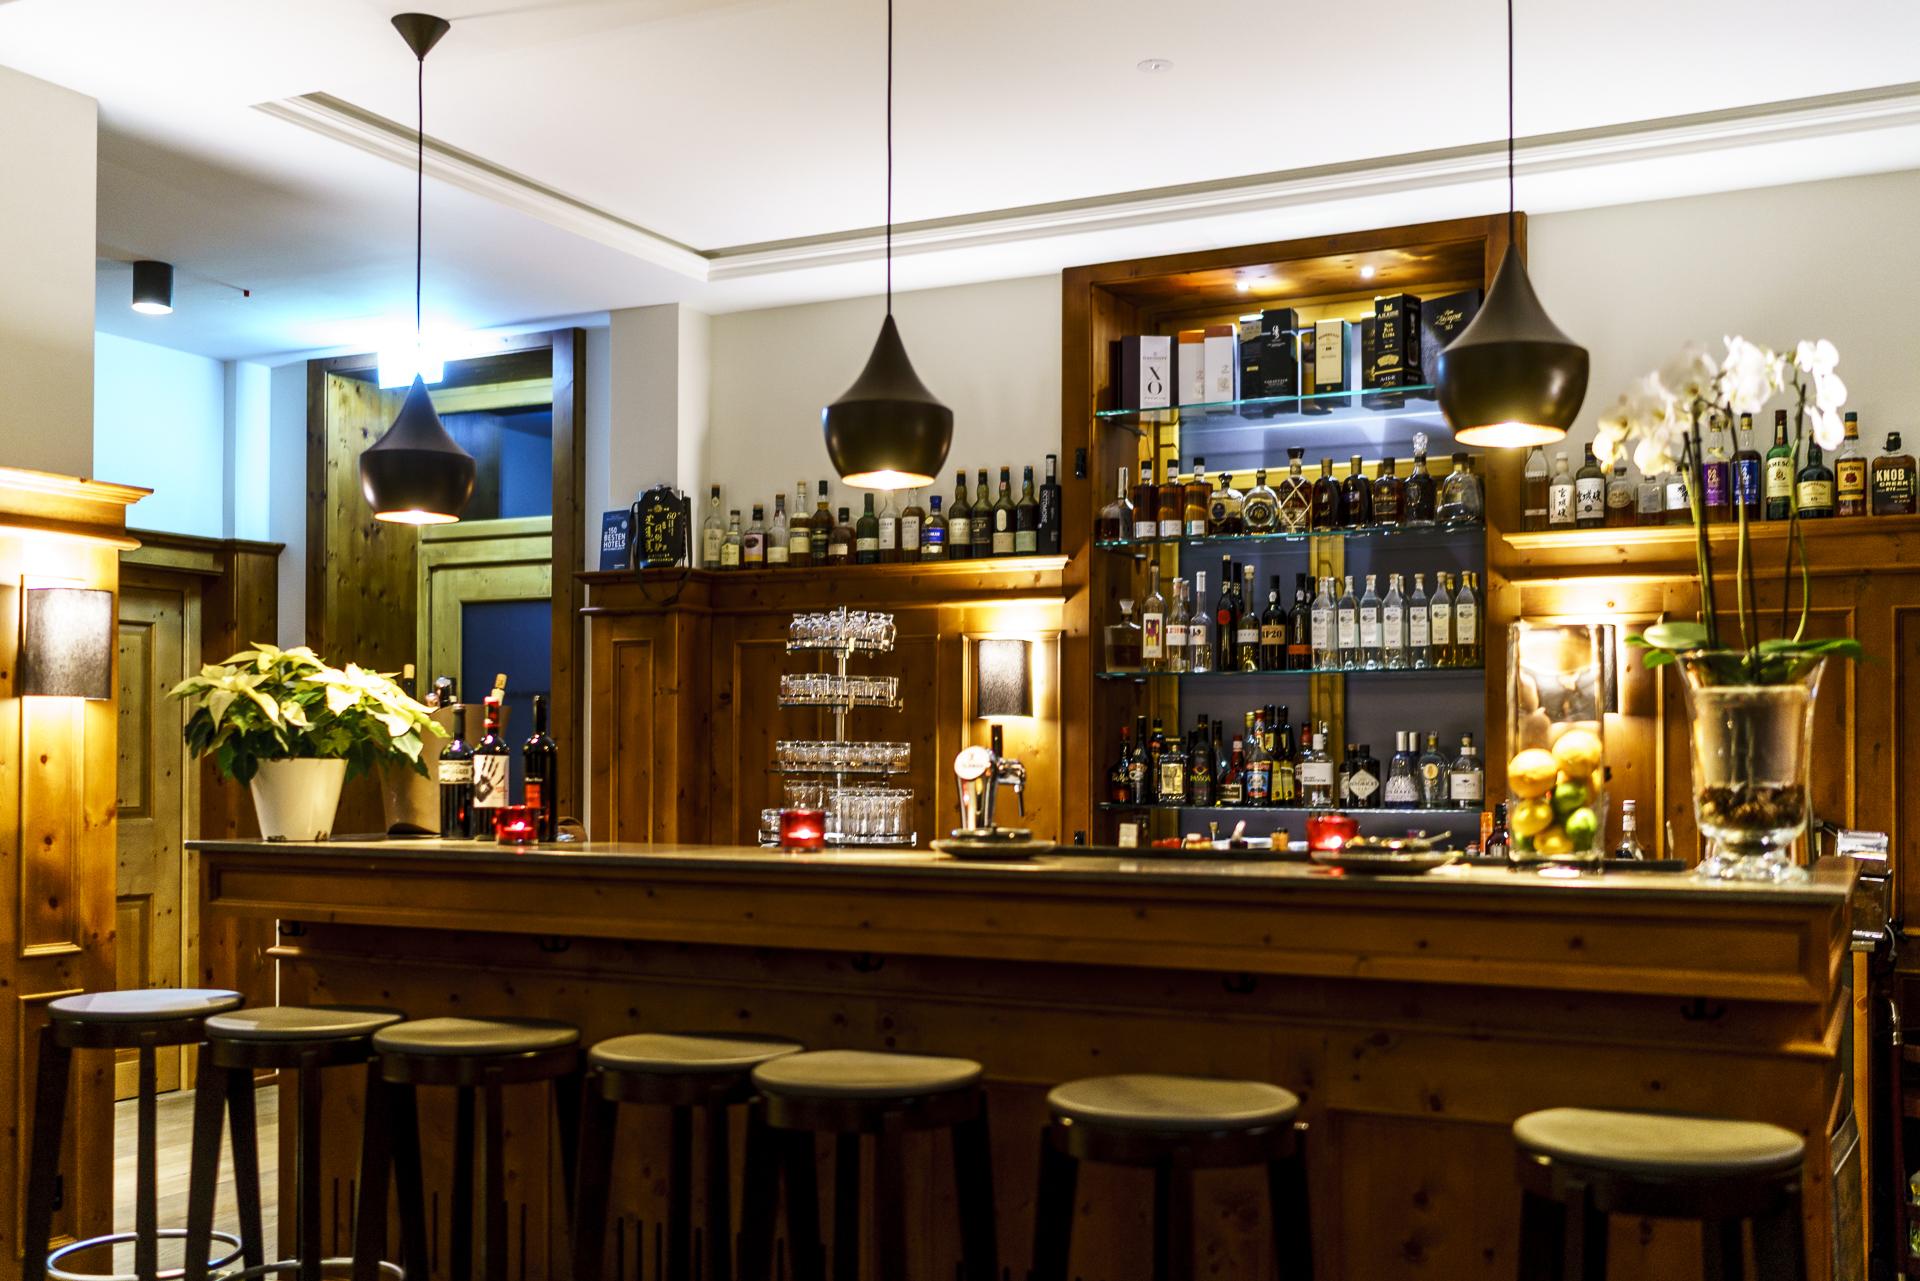 The-Alpina-Tschiertsche-Bar